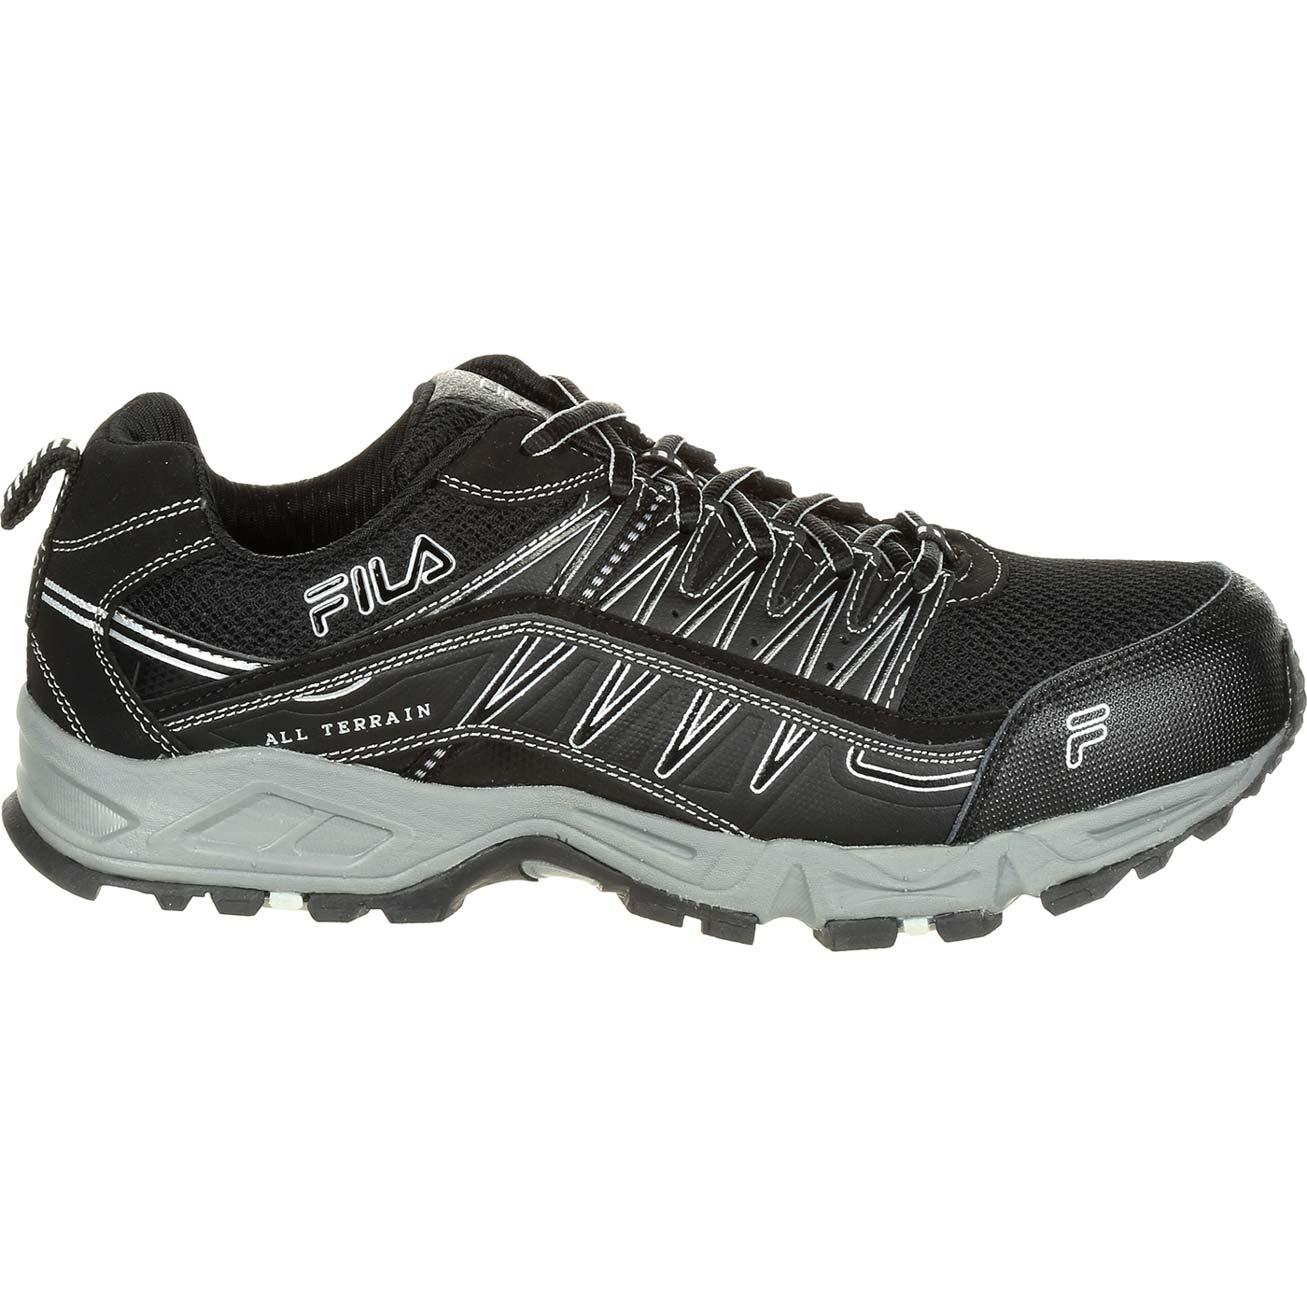 4a2d7c19e2 Fila At Peak Steel Toe Work Athletic Shoe